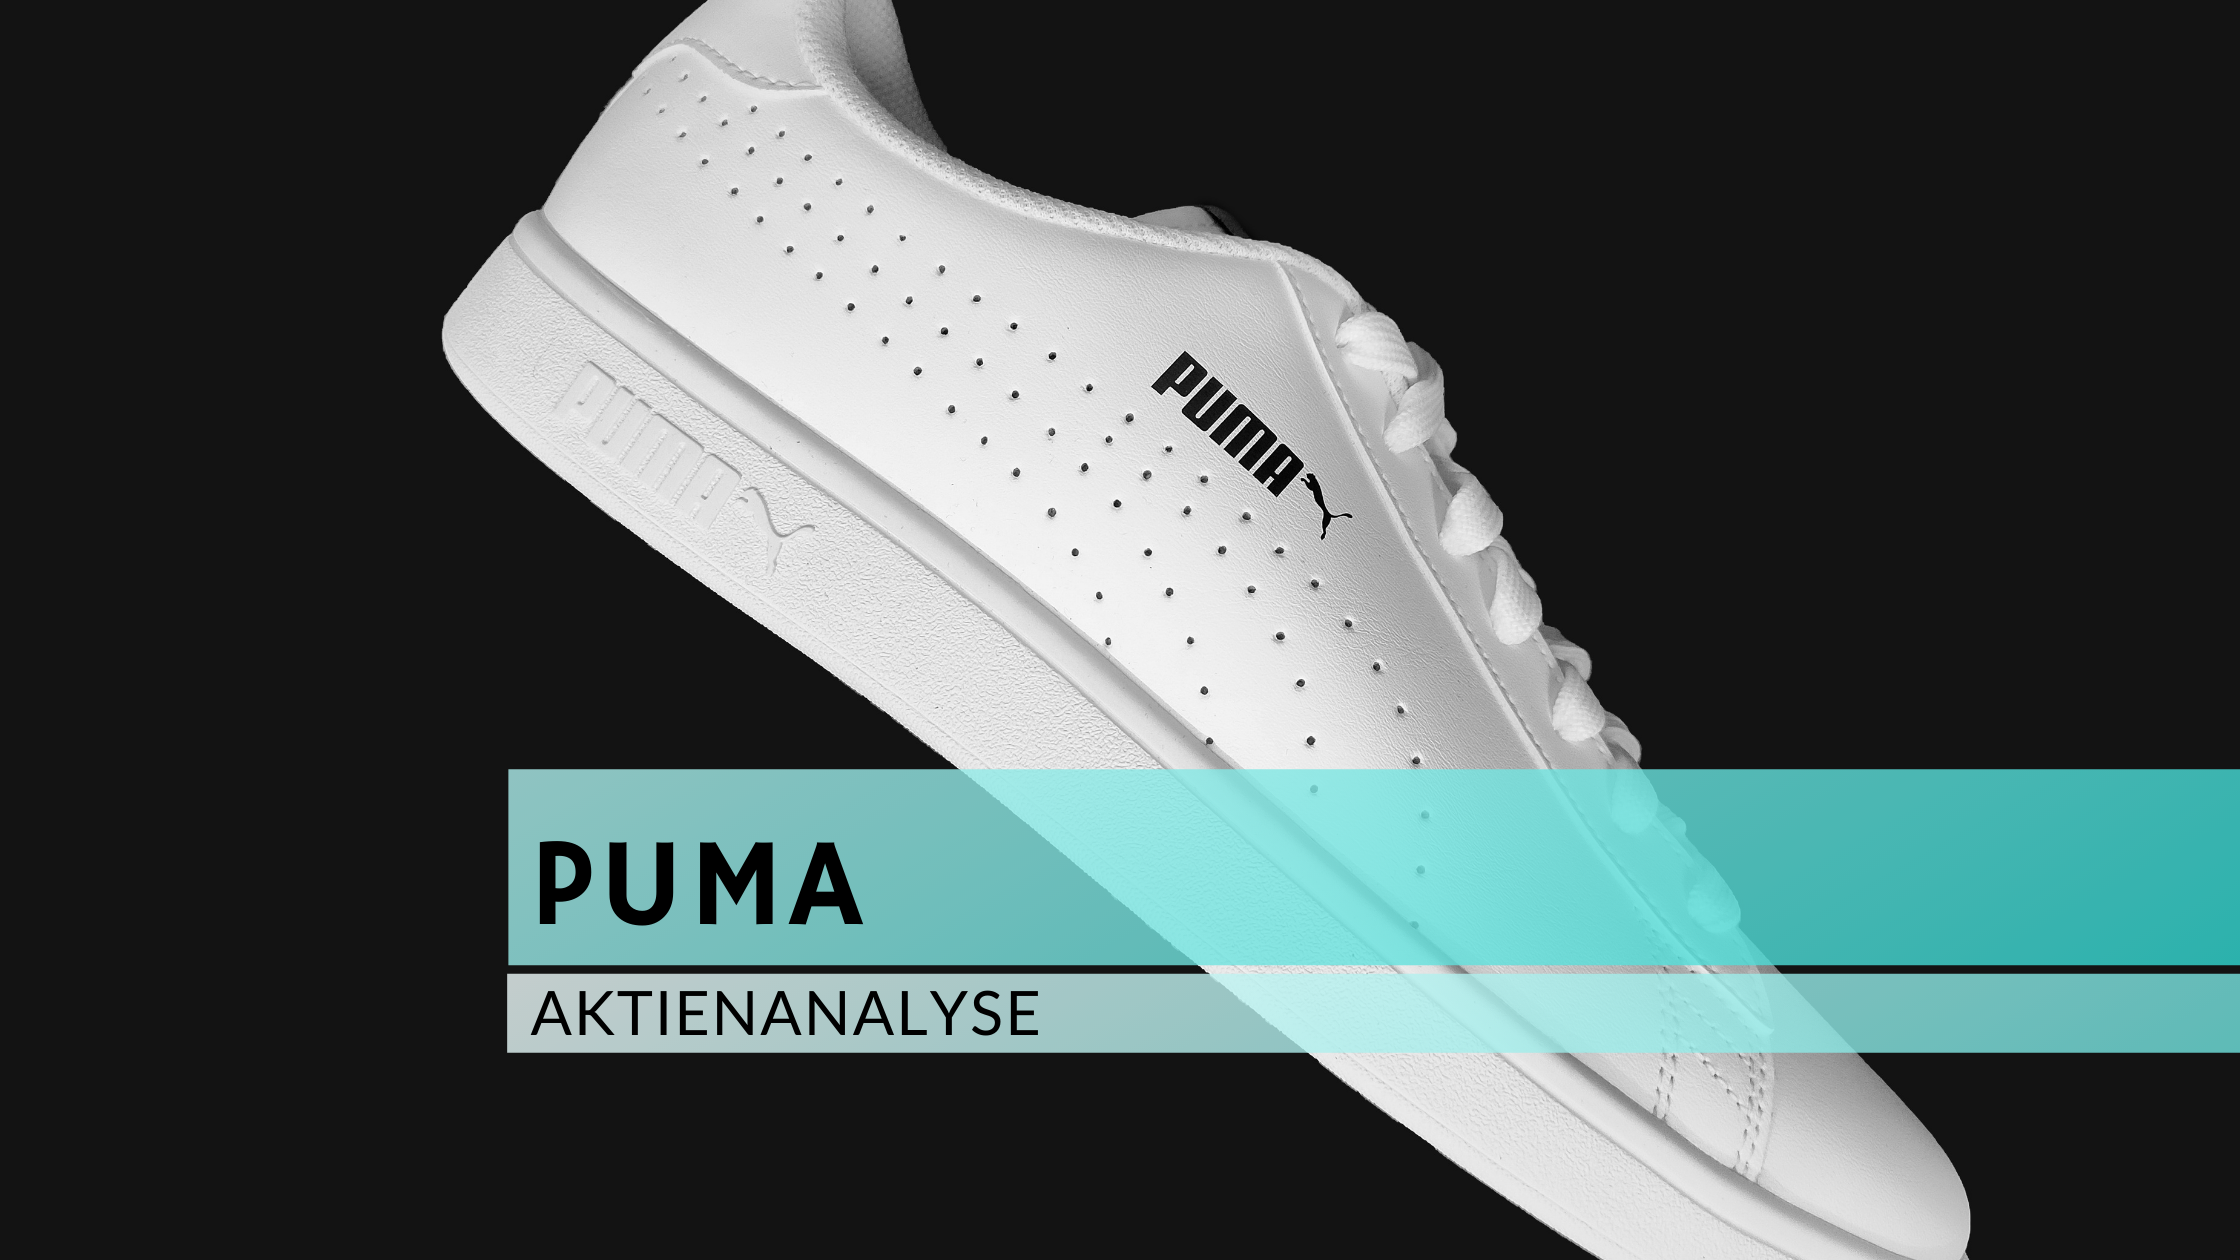 Puma Aktienanalyse